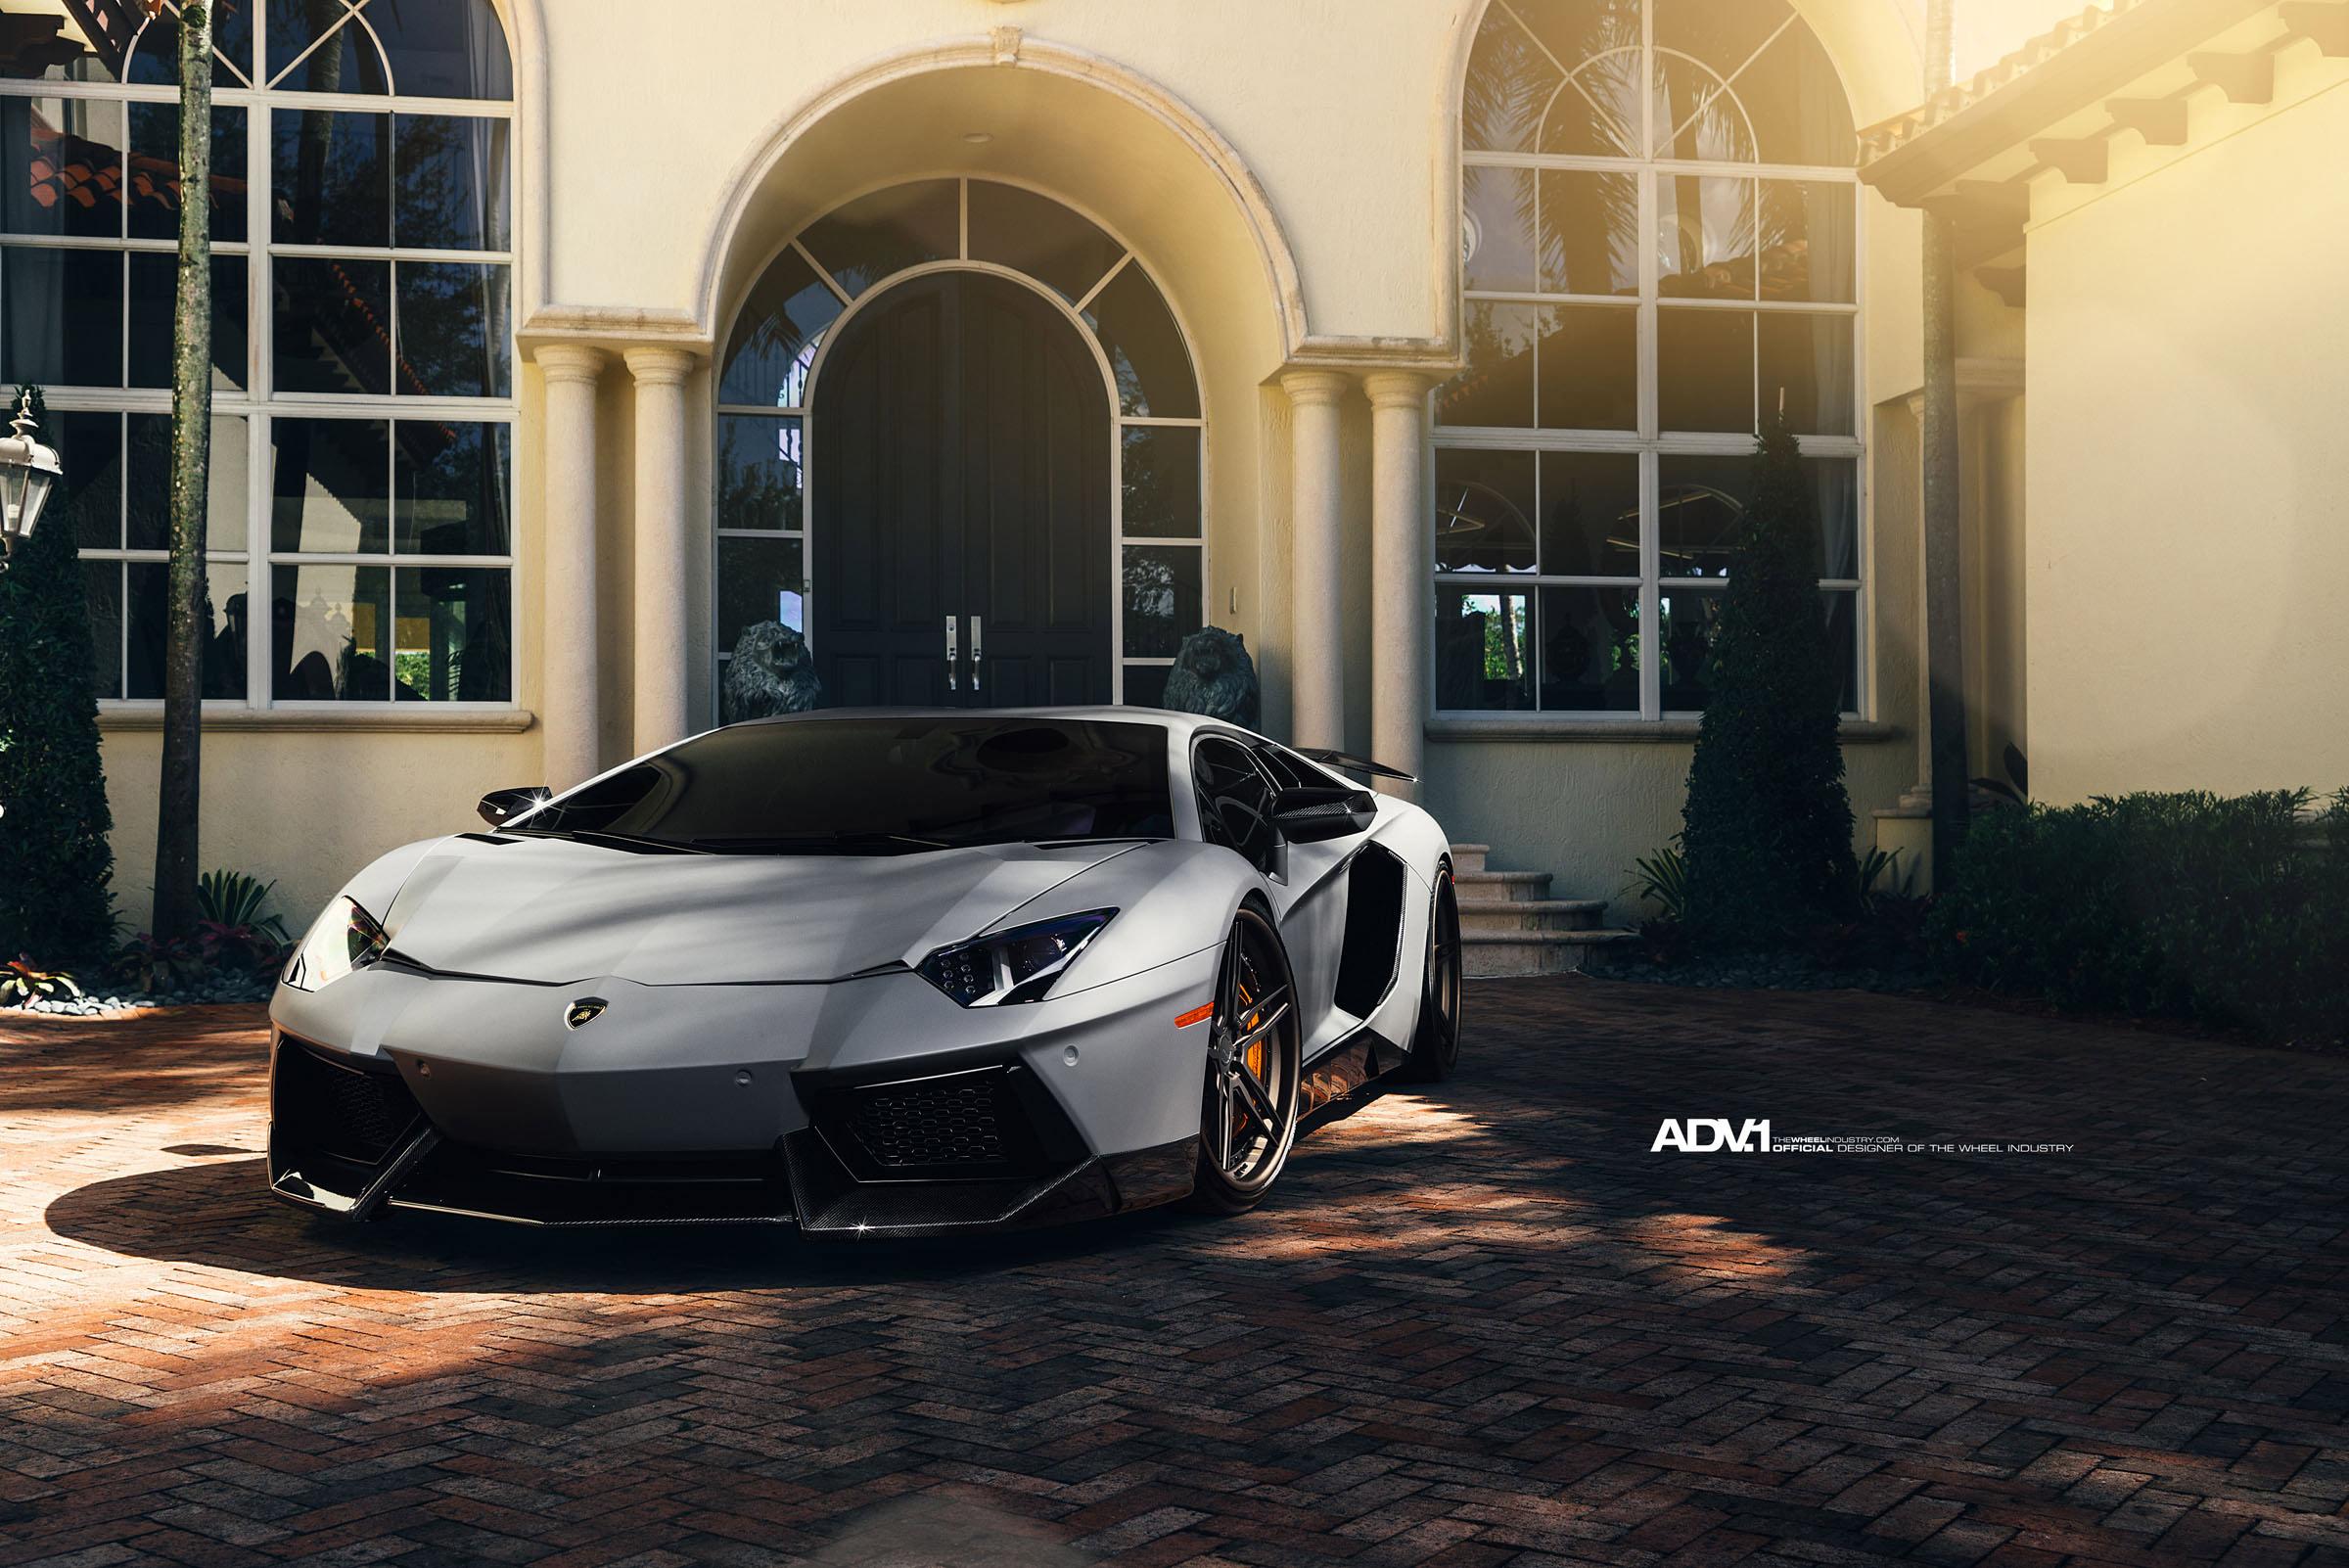 Adv1 Aventador Lamborghini Miami Wallpapers: Потрясающий Novitec Lamborghini Aventador на колесах ADV.1